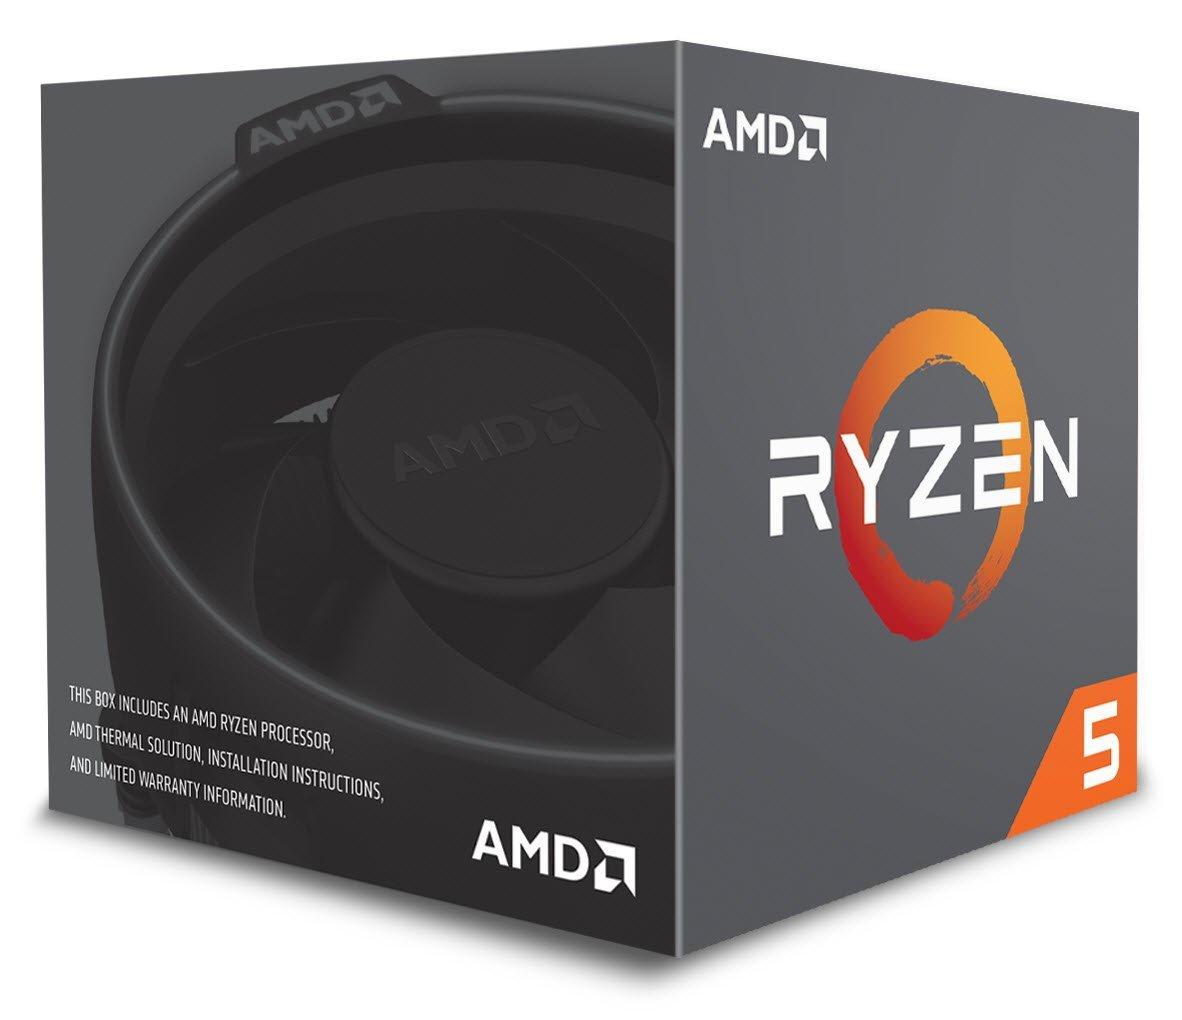 AMD Ryzen 5 2600 procesador Caja 3,4 GHz 16 MB L3